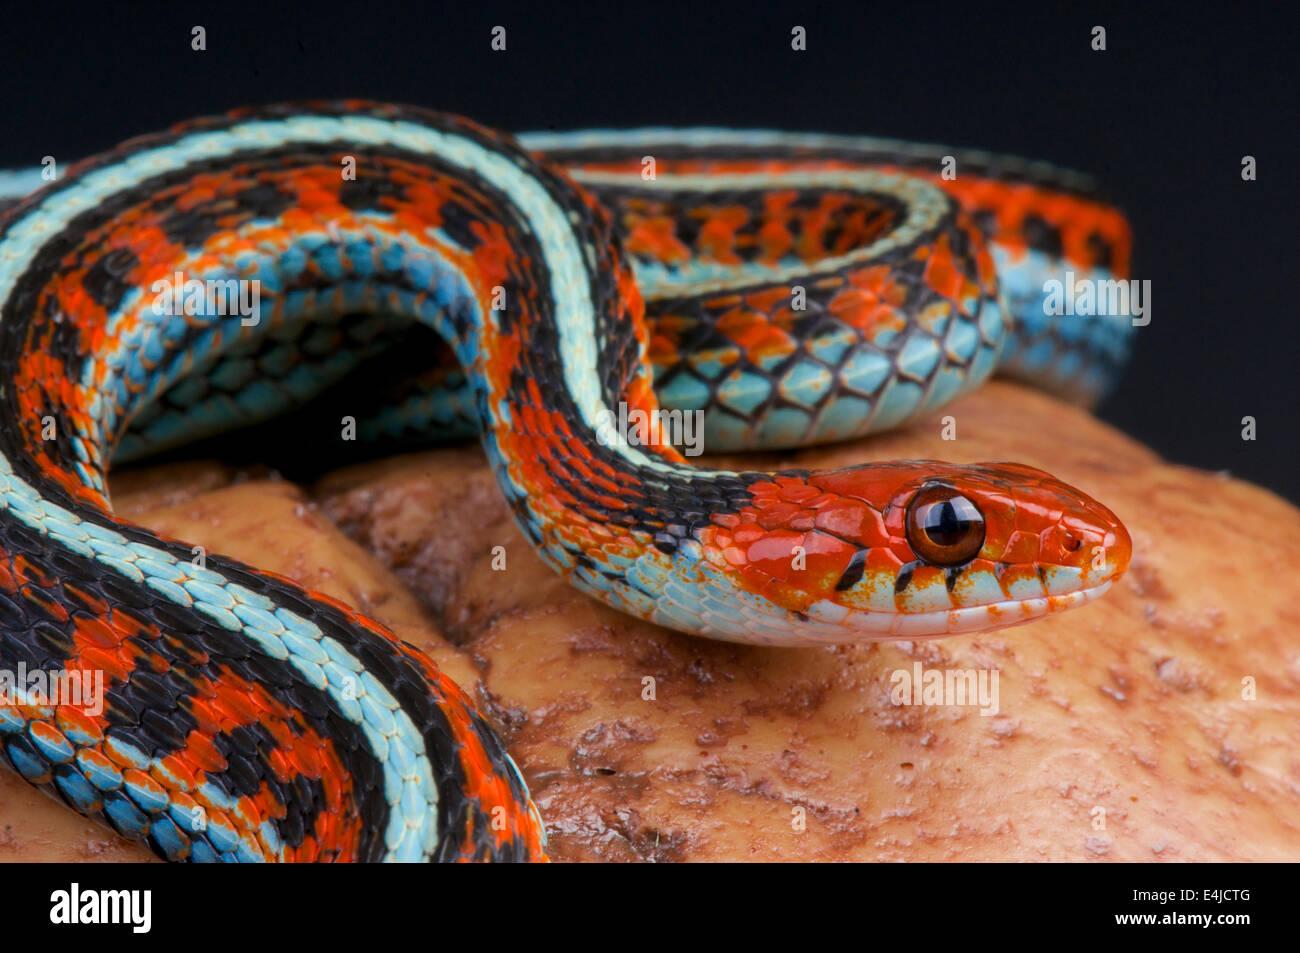 San Fransisco garter snake / Thamnophis sirtalis tatraenia - Stock Image